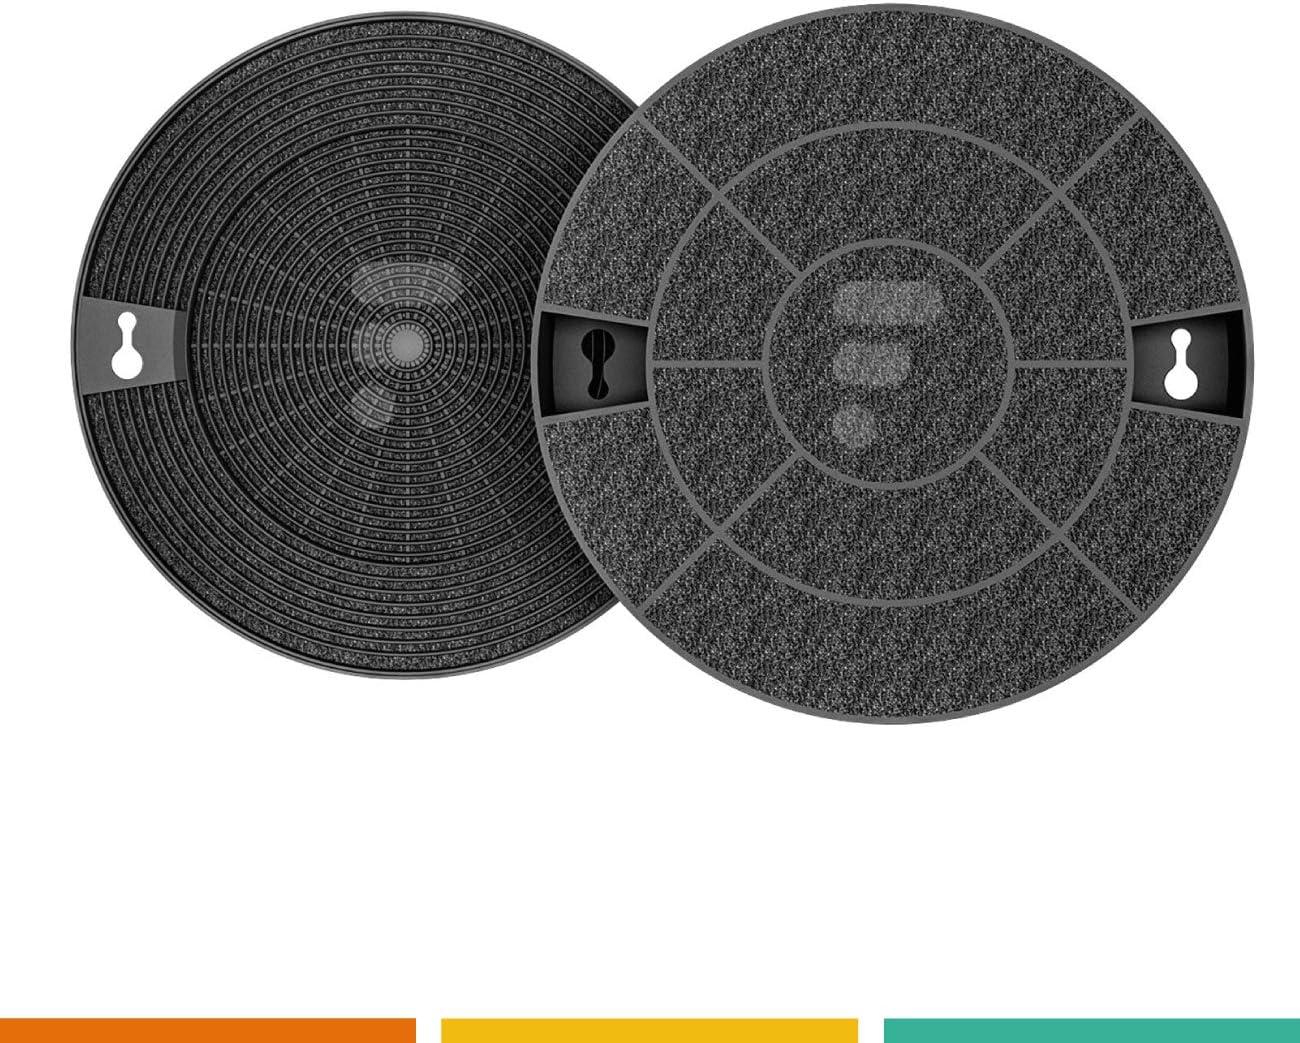 2 filtros de carbón FC16 – Compatible con IKEA NYTTIG fil600 Whirlpool AMC912 Brandt afc29 AEG Type 29 Wpro chf029/1: Amazon.es: Grandes electrodomésticos